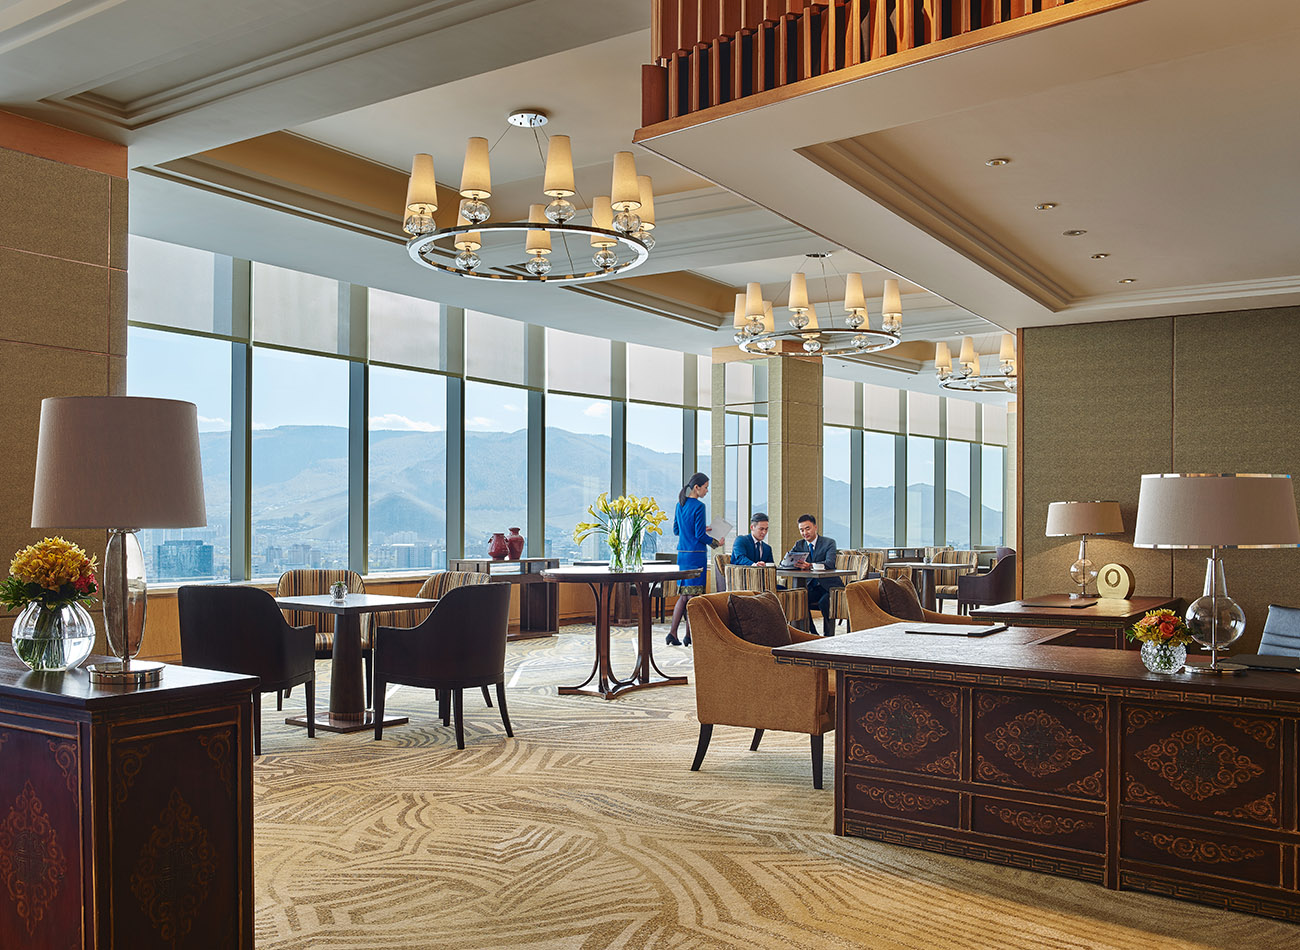 Shangri-La Ulaanbaatar Horizon Club Lounge, Mongolia